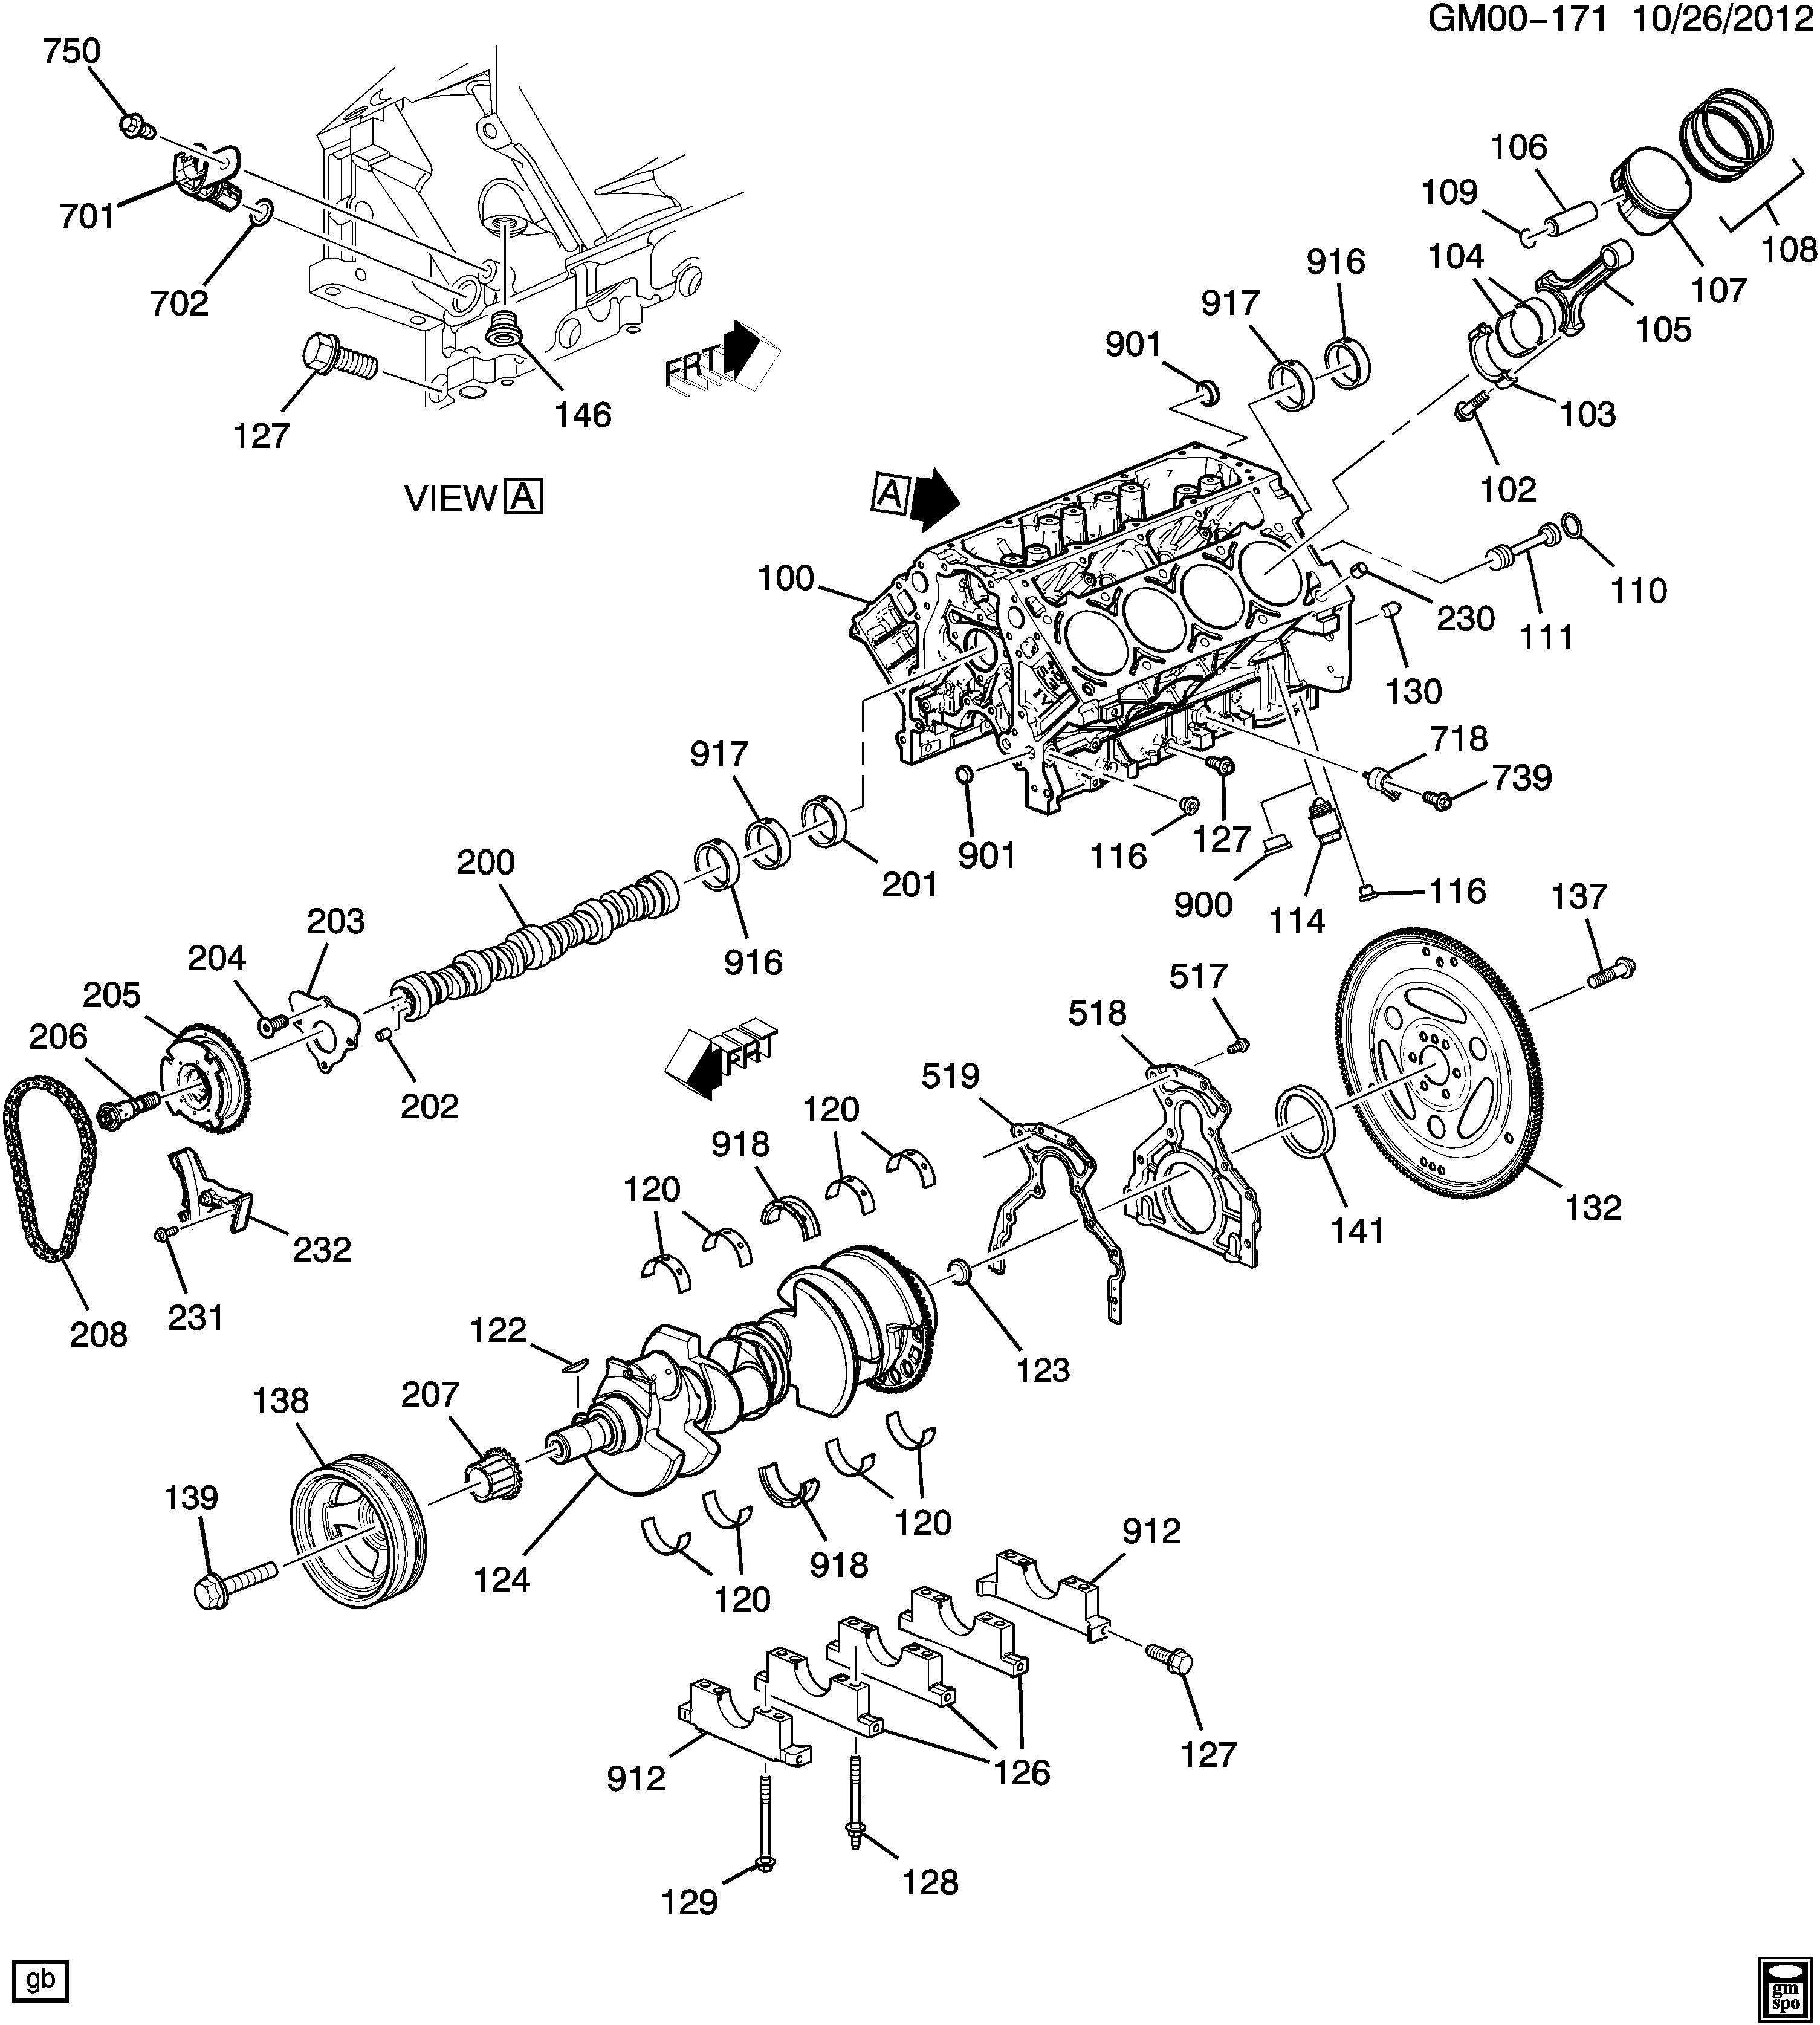 Hummer H3 Engine Rear Main Bearing. SEAL. SEAL KIT